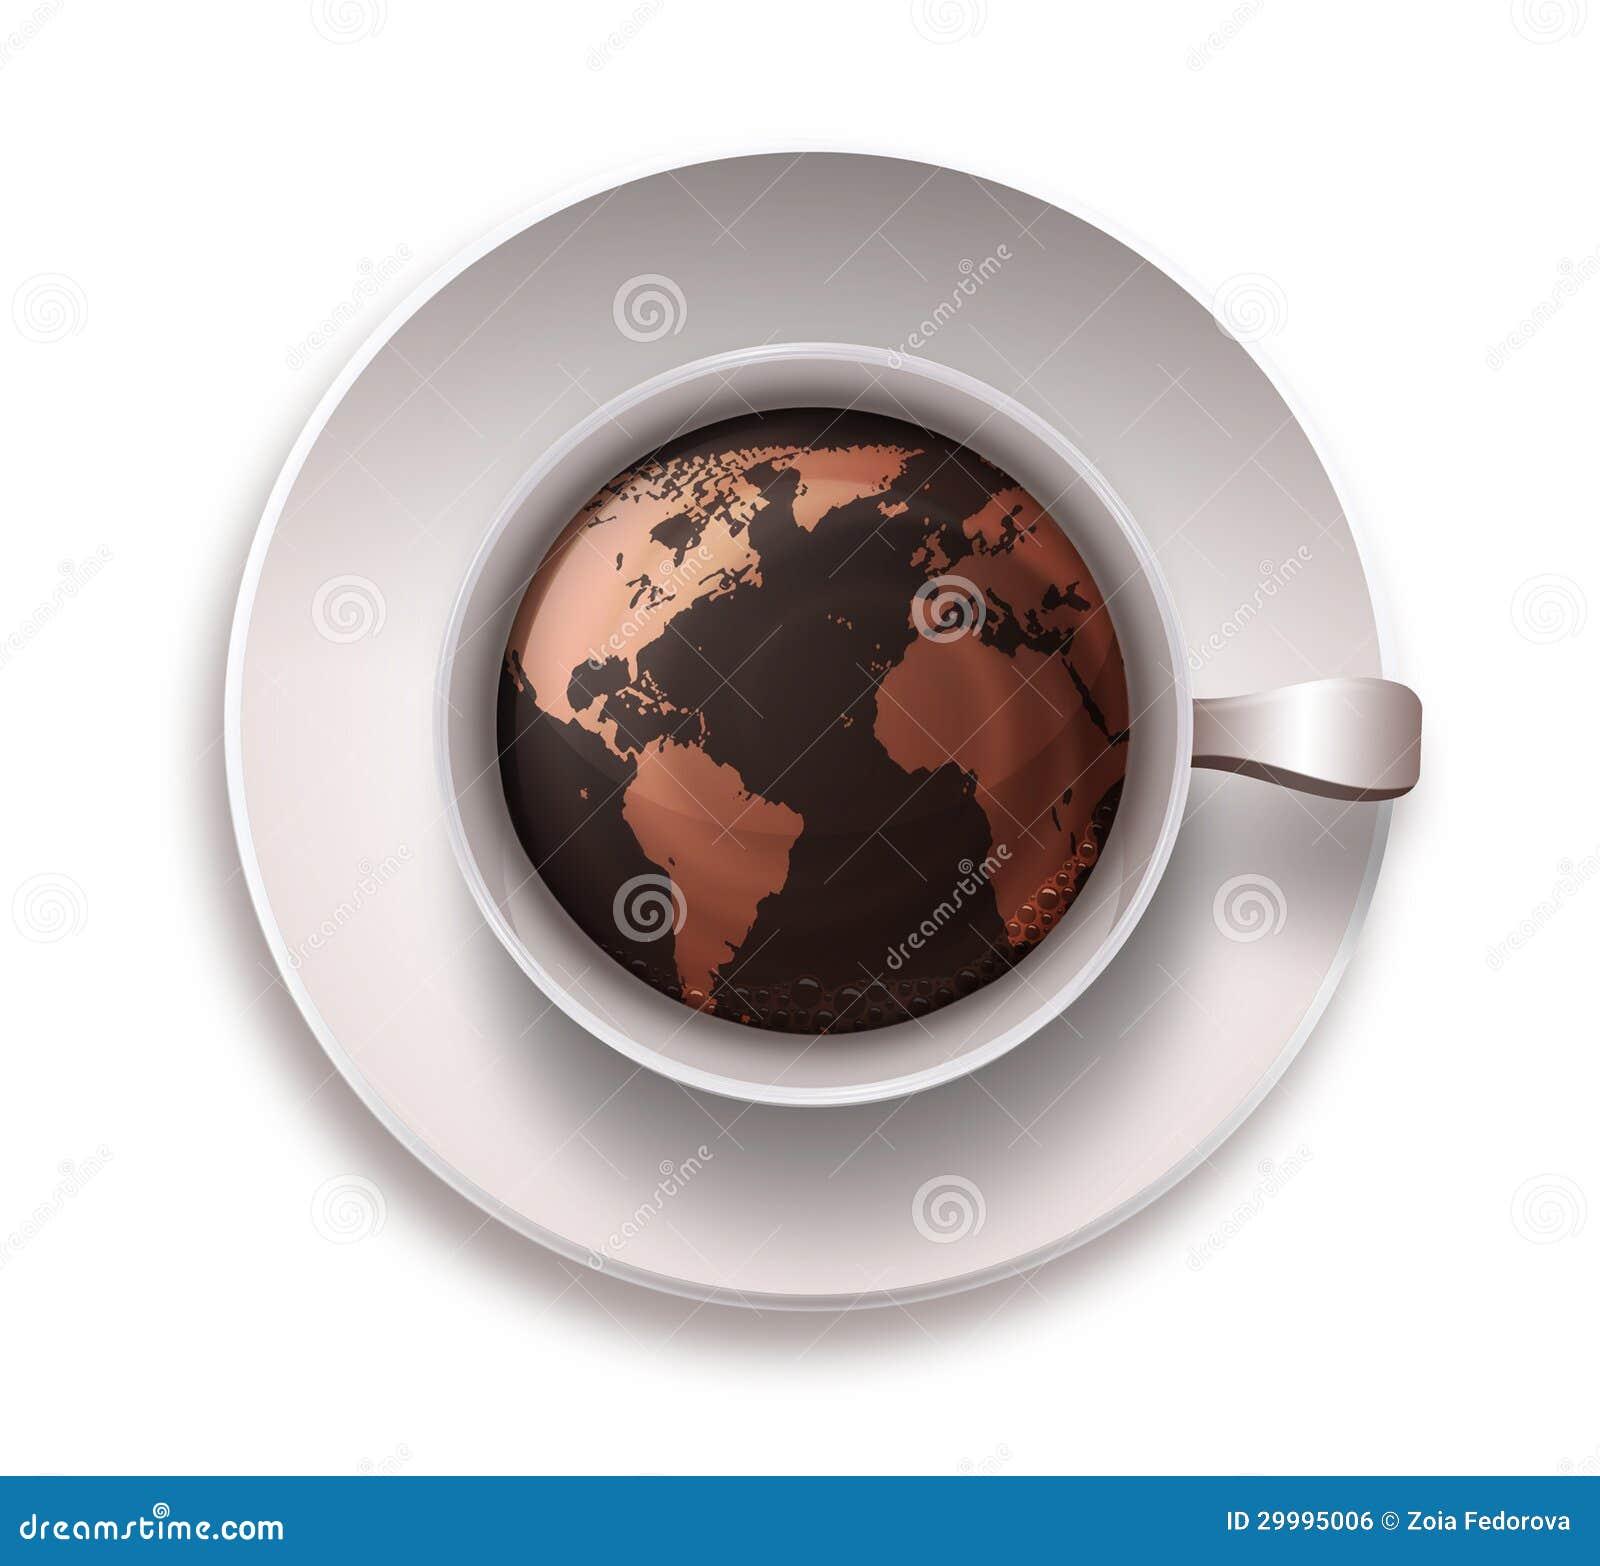 Black hole coffee mug global domination favorite milf Allie